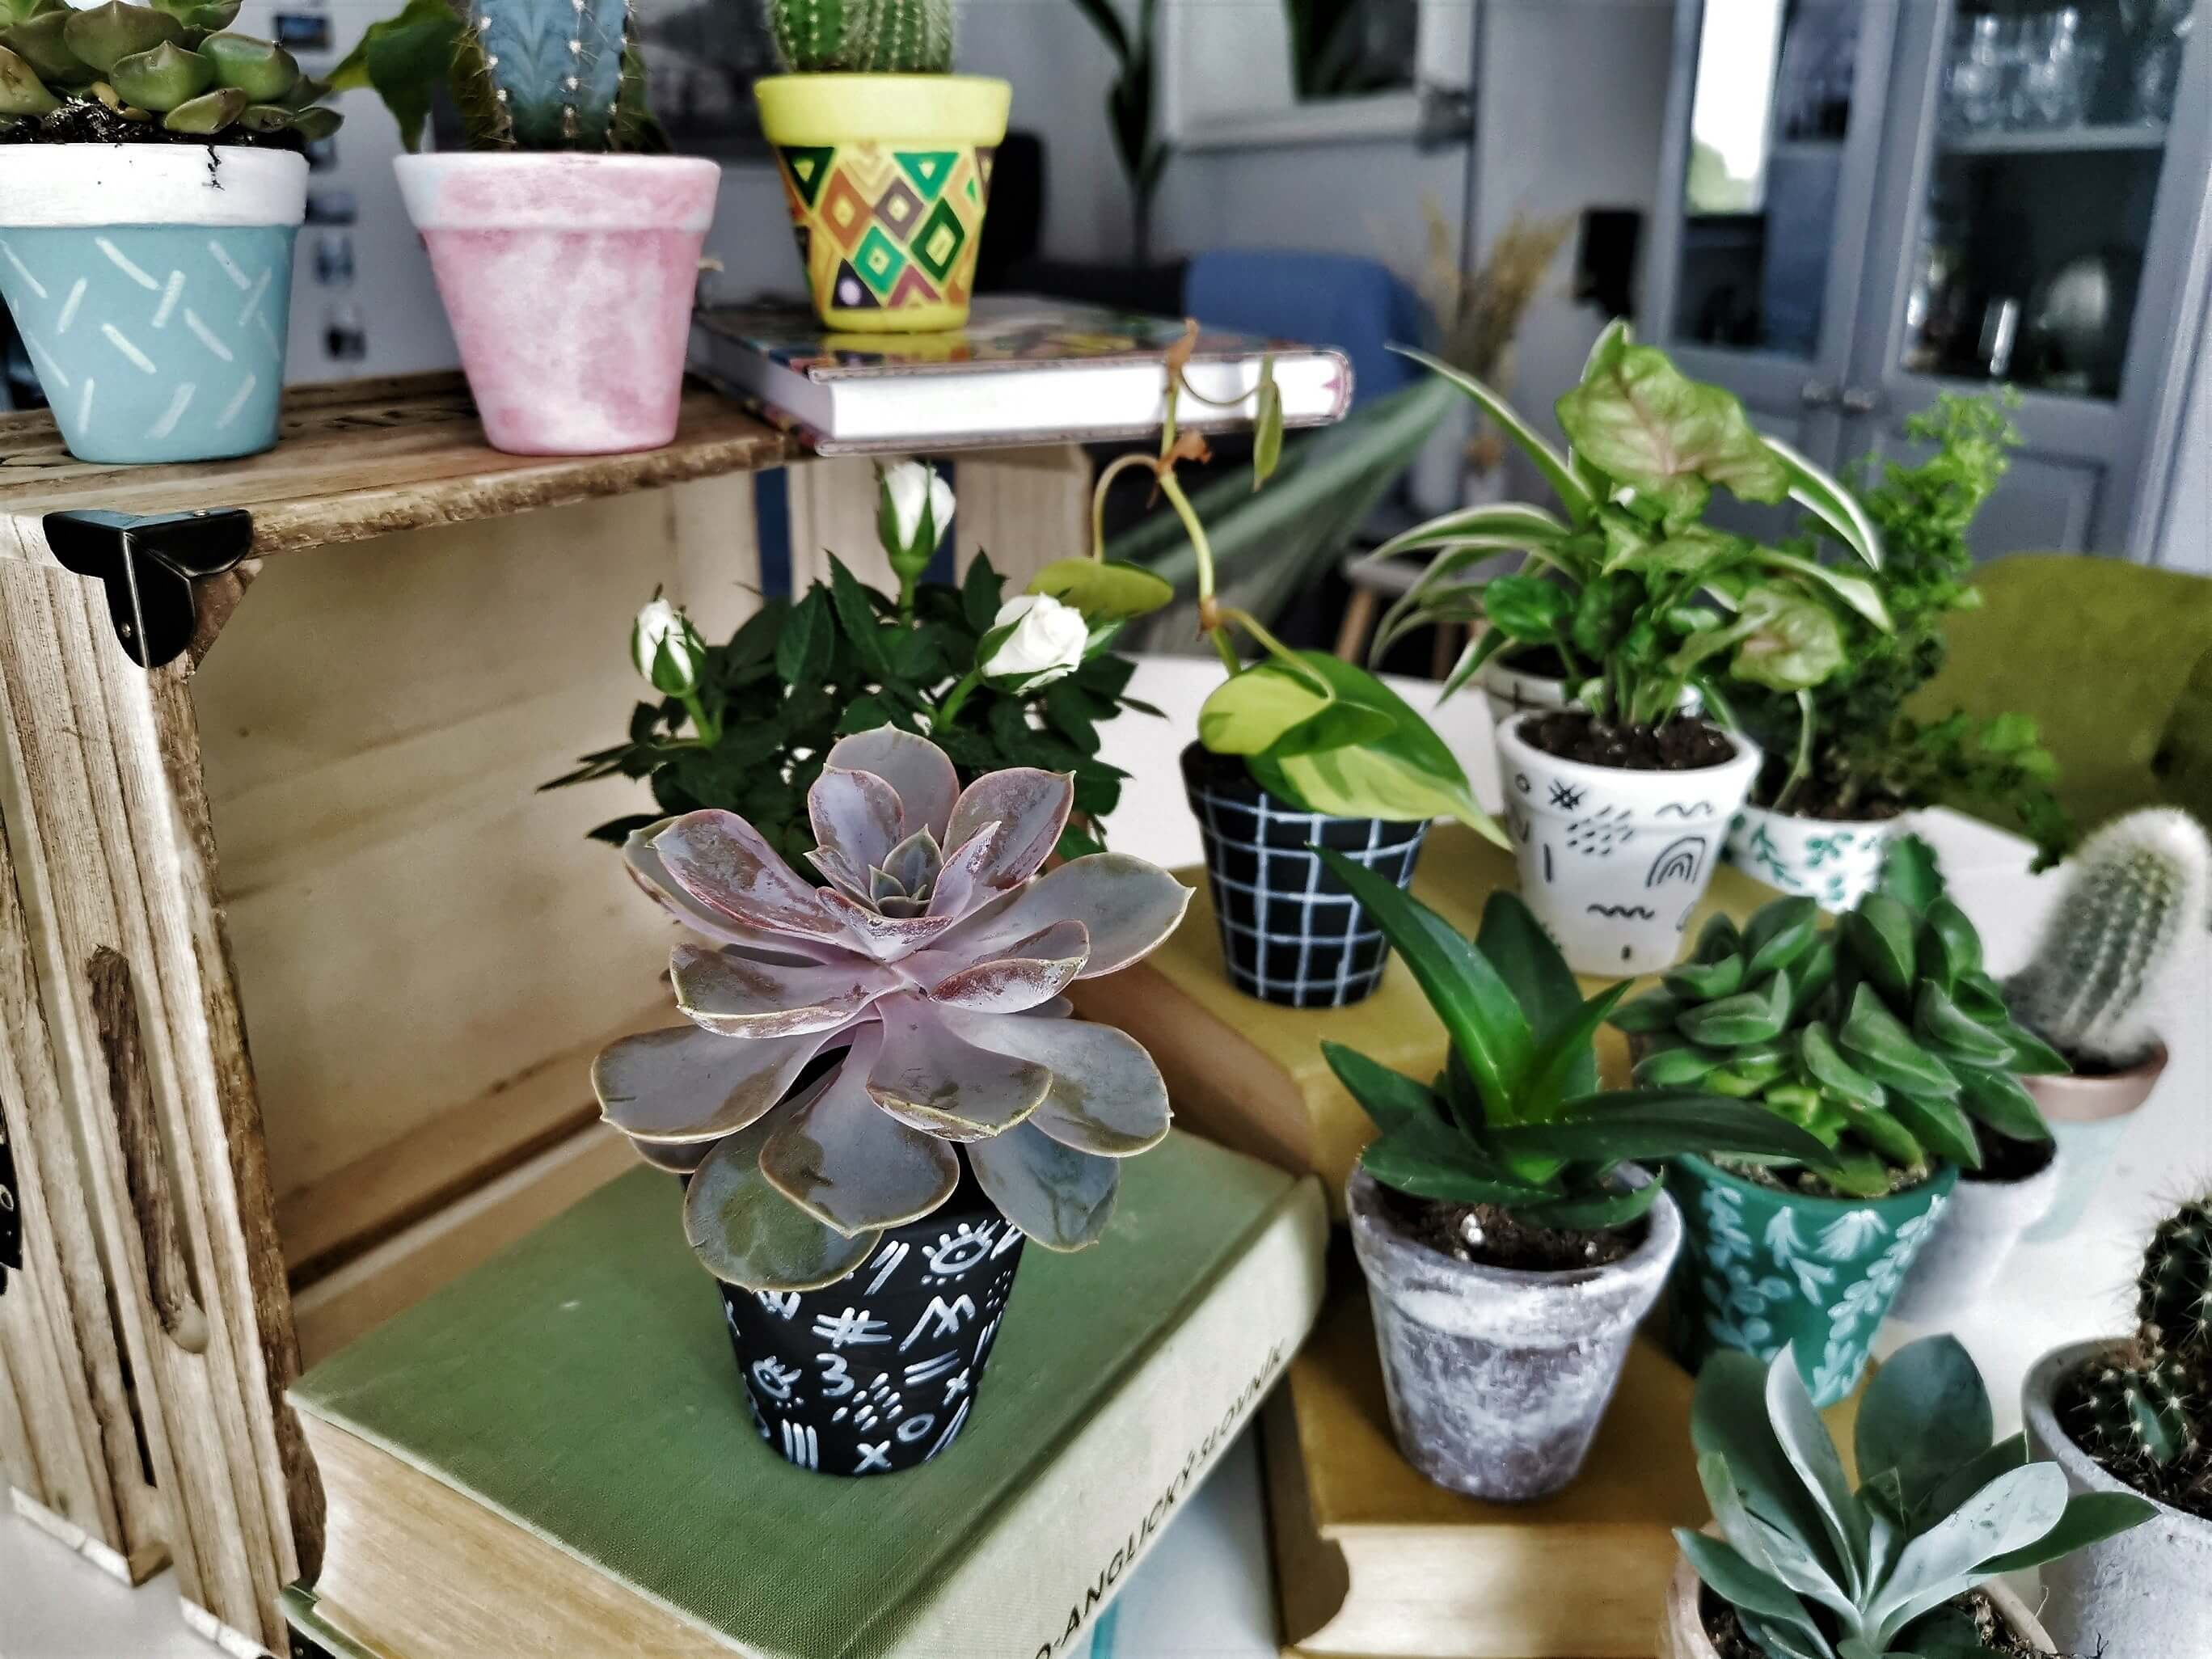 IMG 20190612 132023 02 resized 20190612 062945588 1 - Kreatives Recycling: Blumentöpfe in 5 verschiedenen Stilen